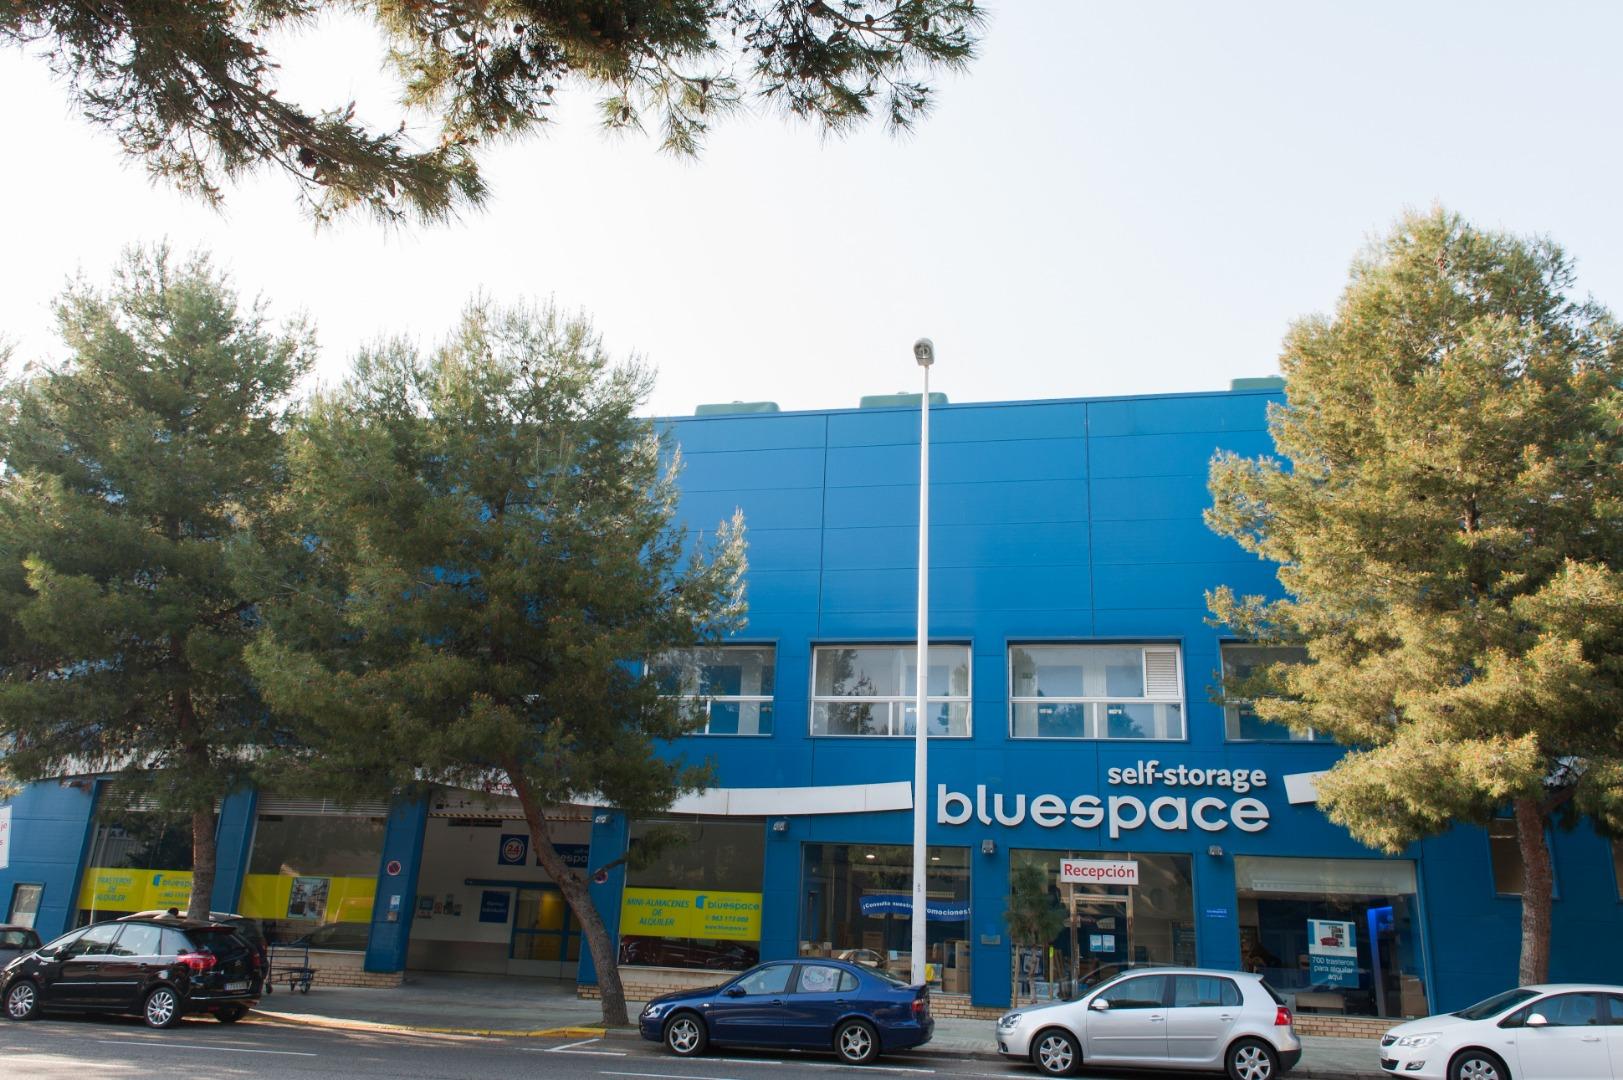 Lloguer Magatzem  Calle valle de la ballestera, 71. Trasteros bluespace de 3 m2 en campanar (Valencia). tenemos dife